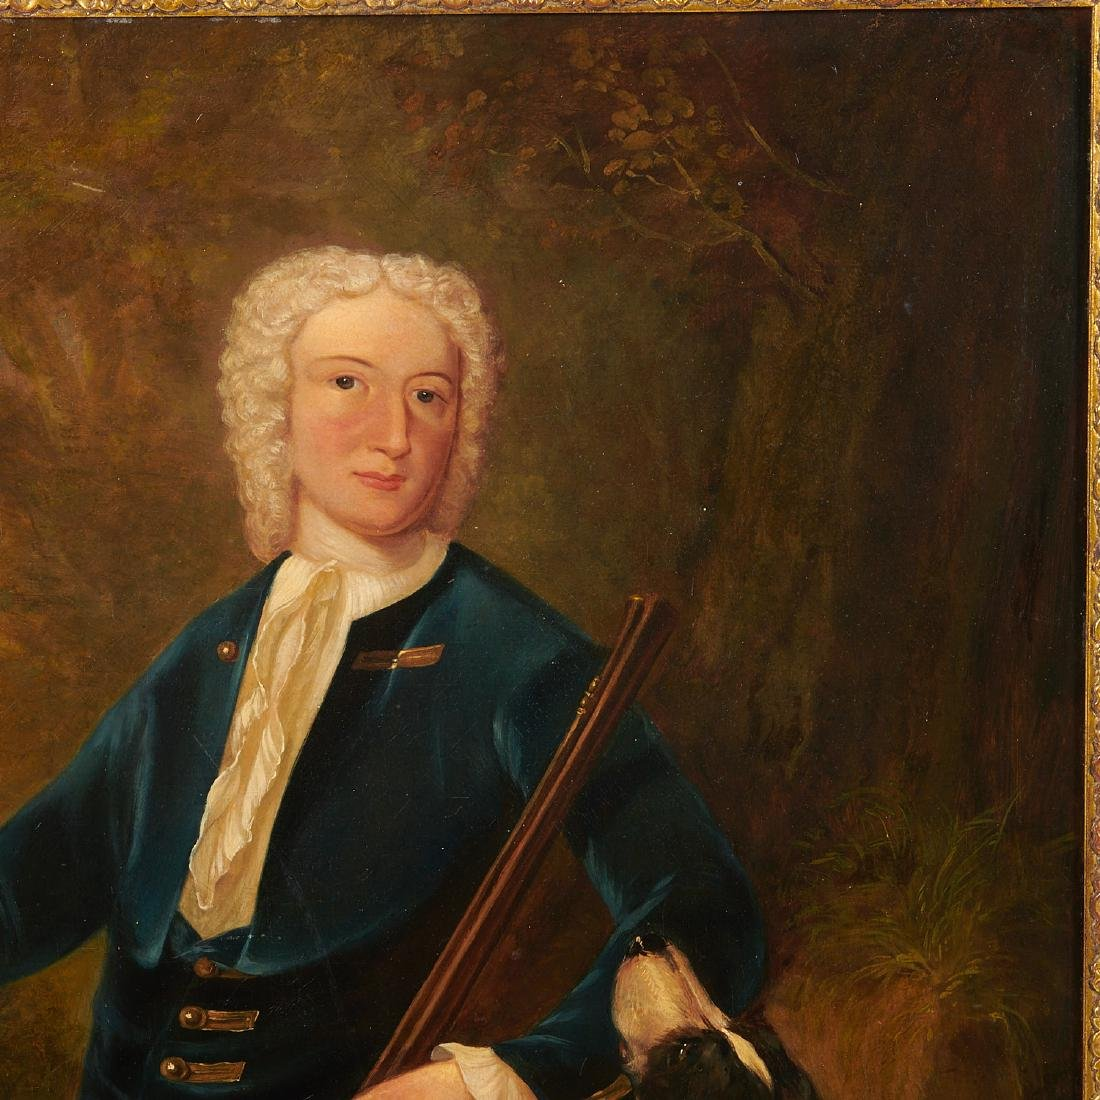 English School, Gentleman on a Hunt, 18th/19th c. - 3